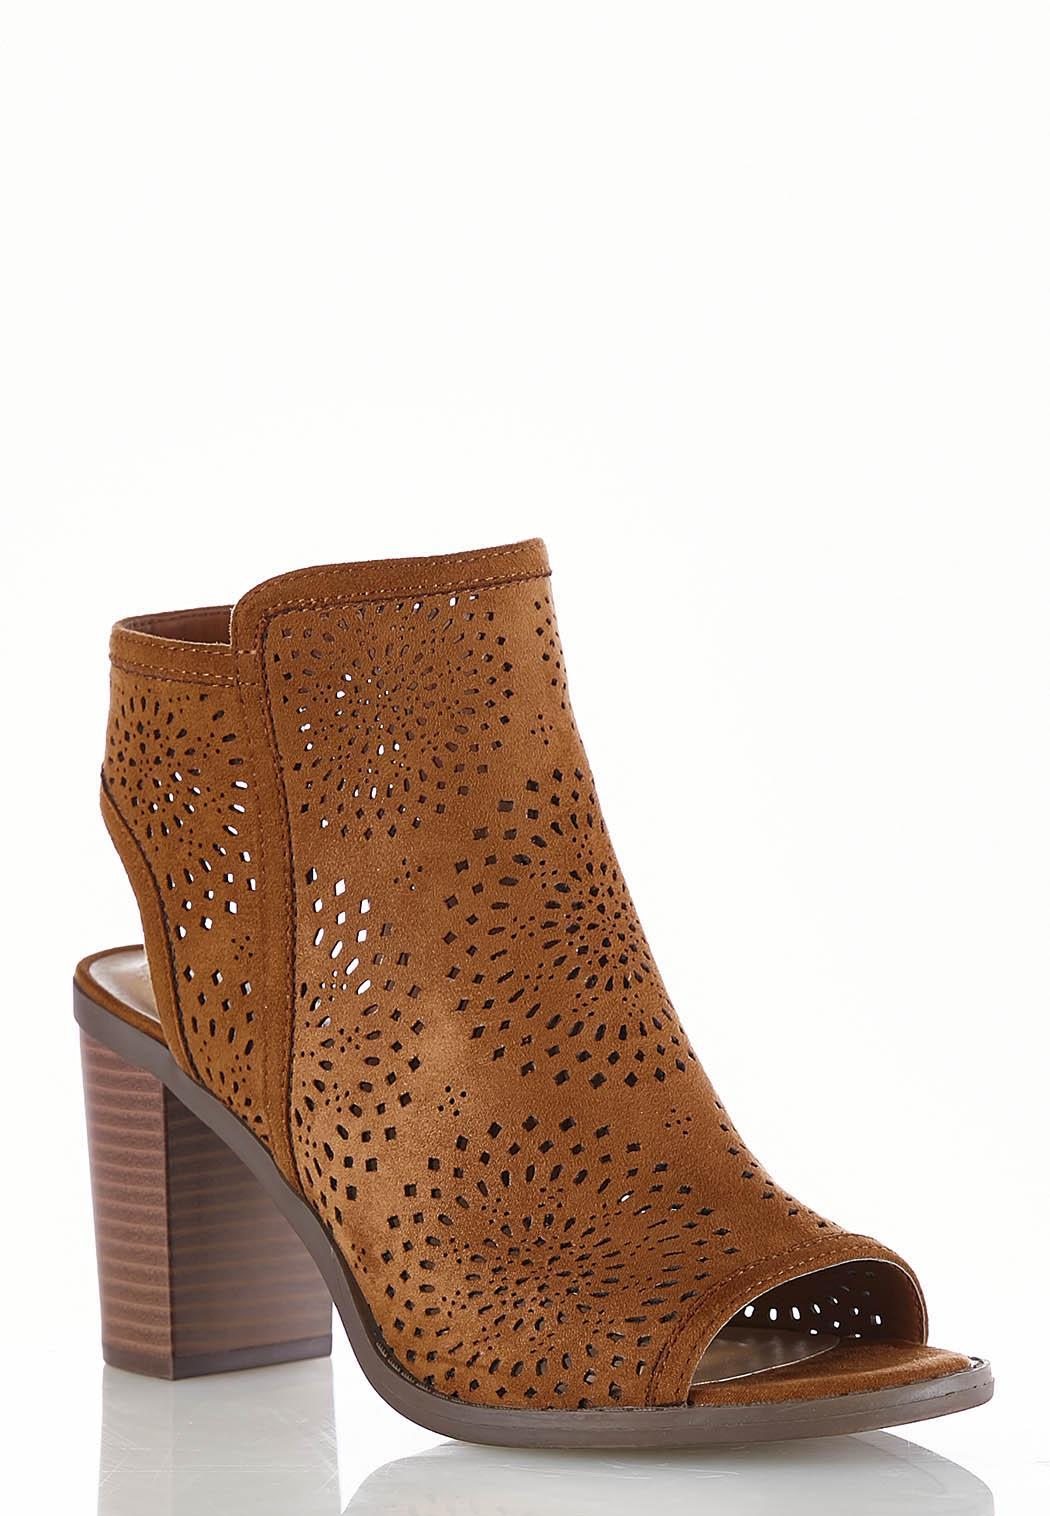 8d1388681ef8 Wide Width Laser Cut Peep Toe Shooties Ankle   Shooties Cato Fashions